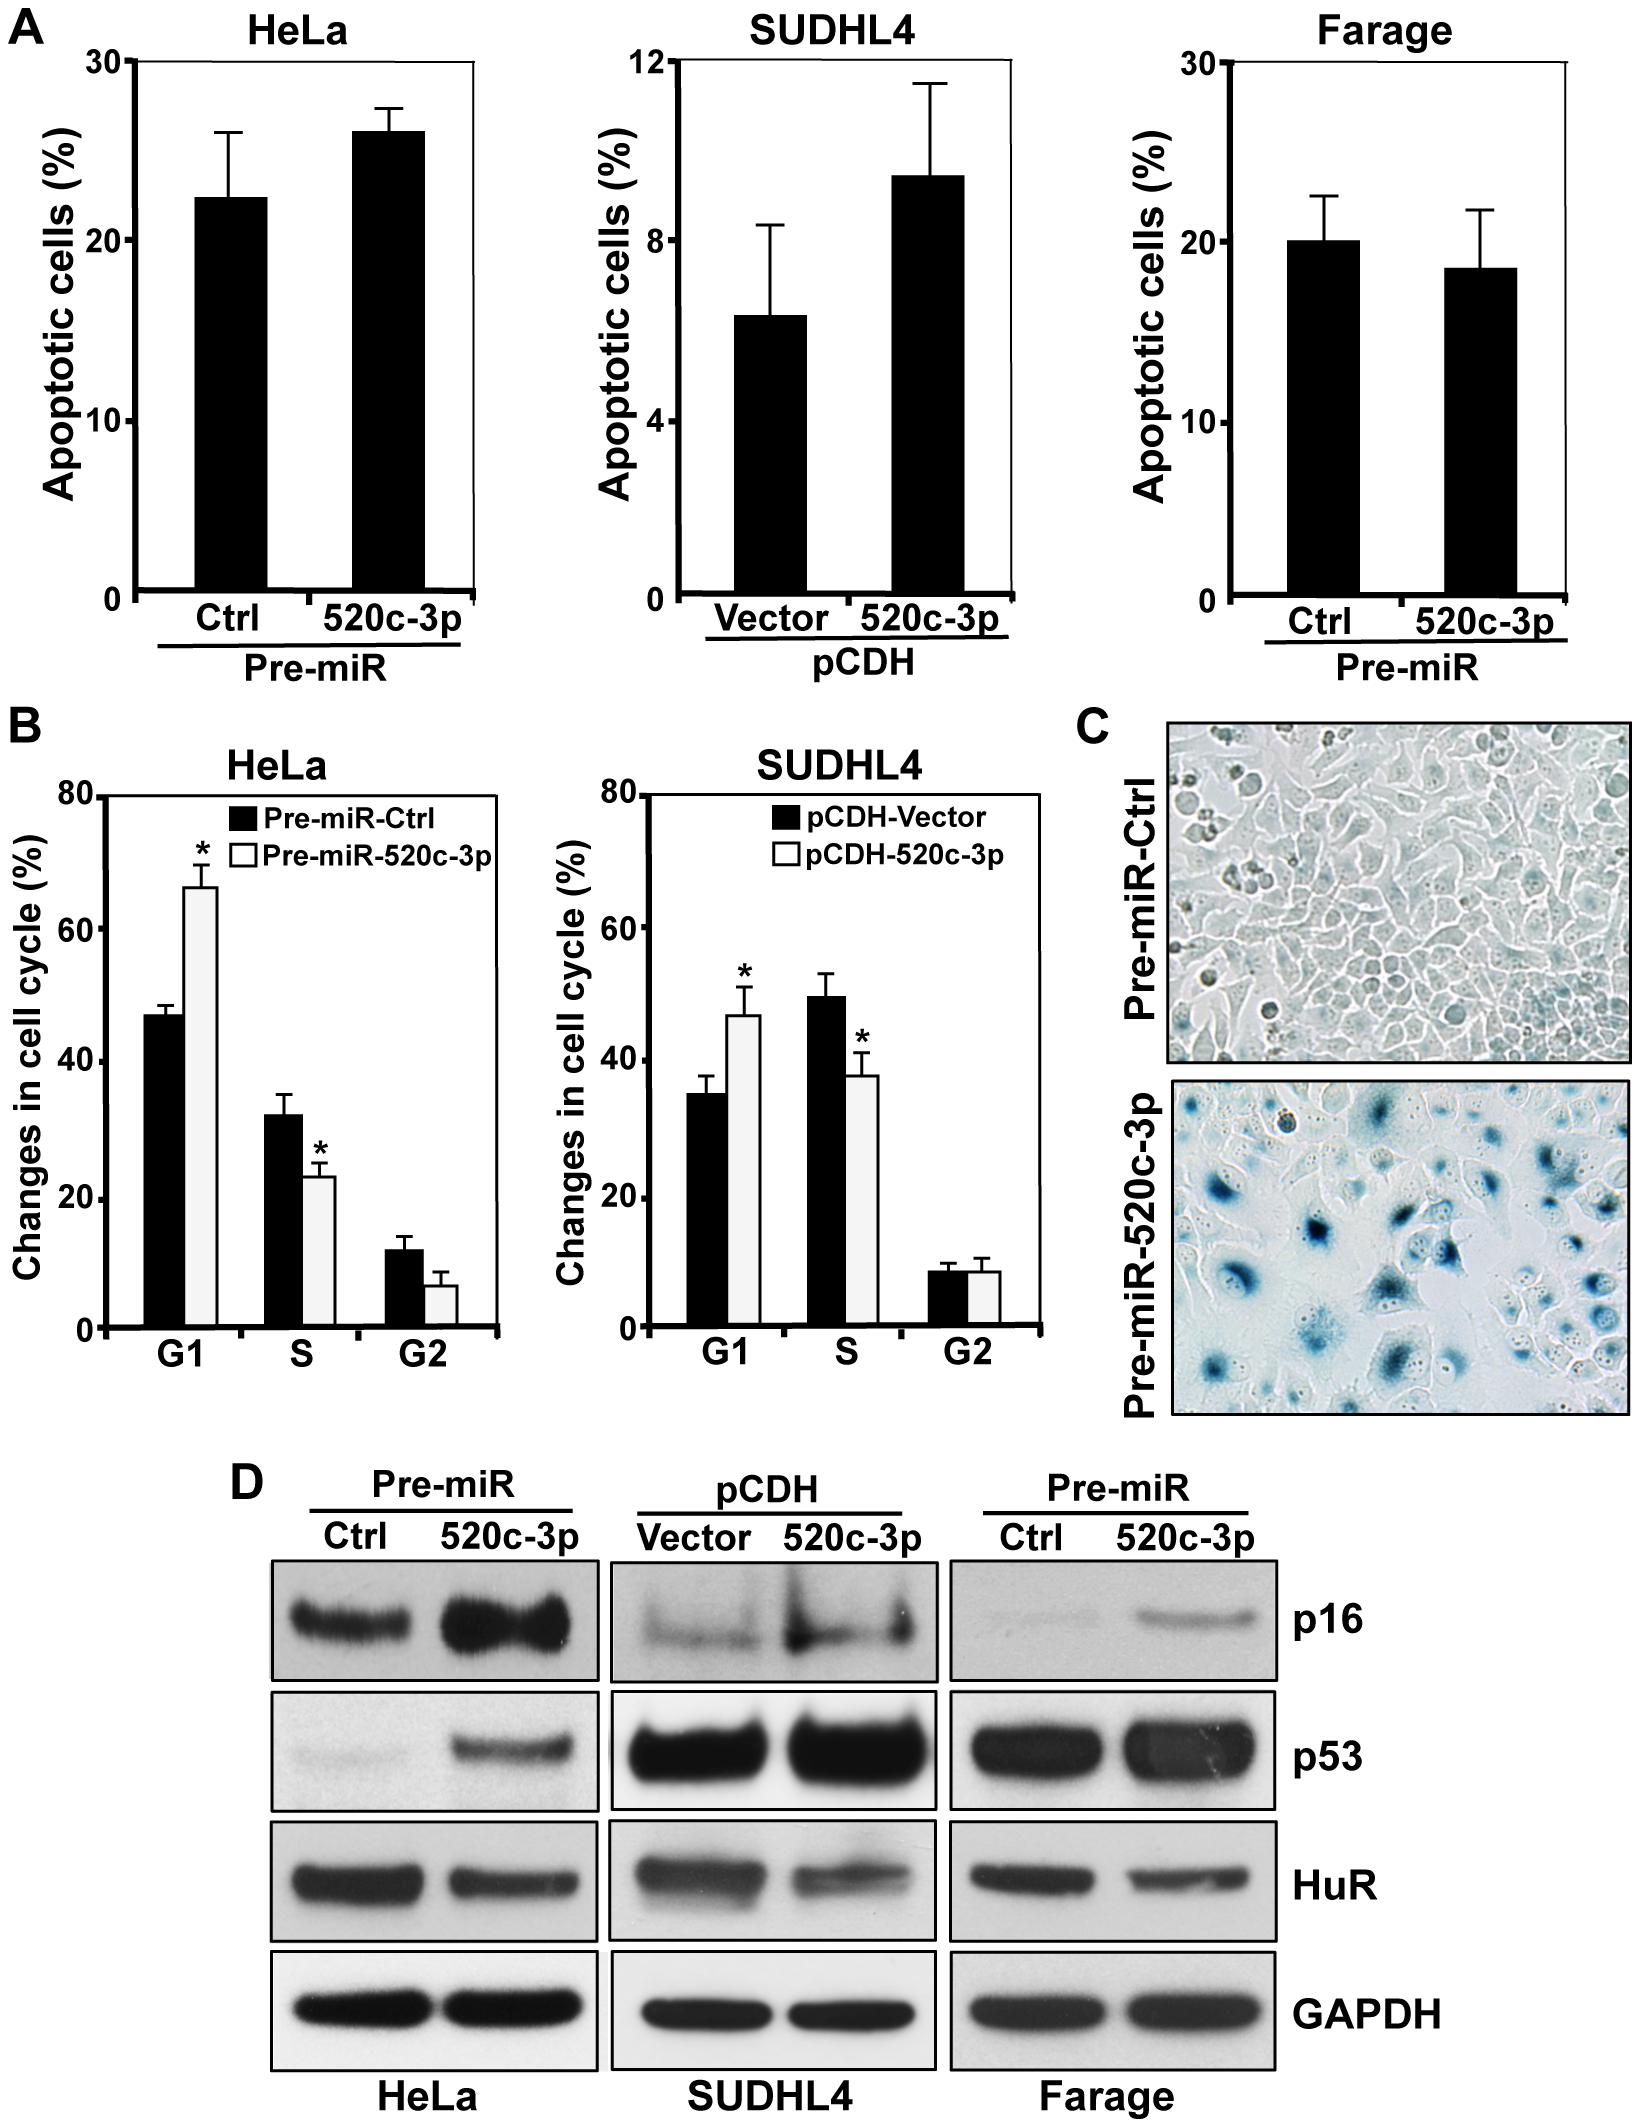 Influence of miR-520c-3p on the senescent phenotype.